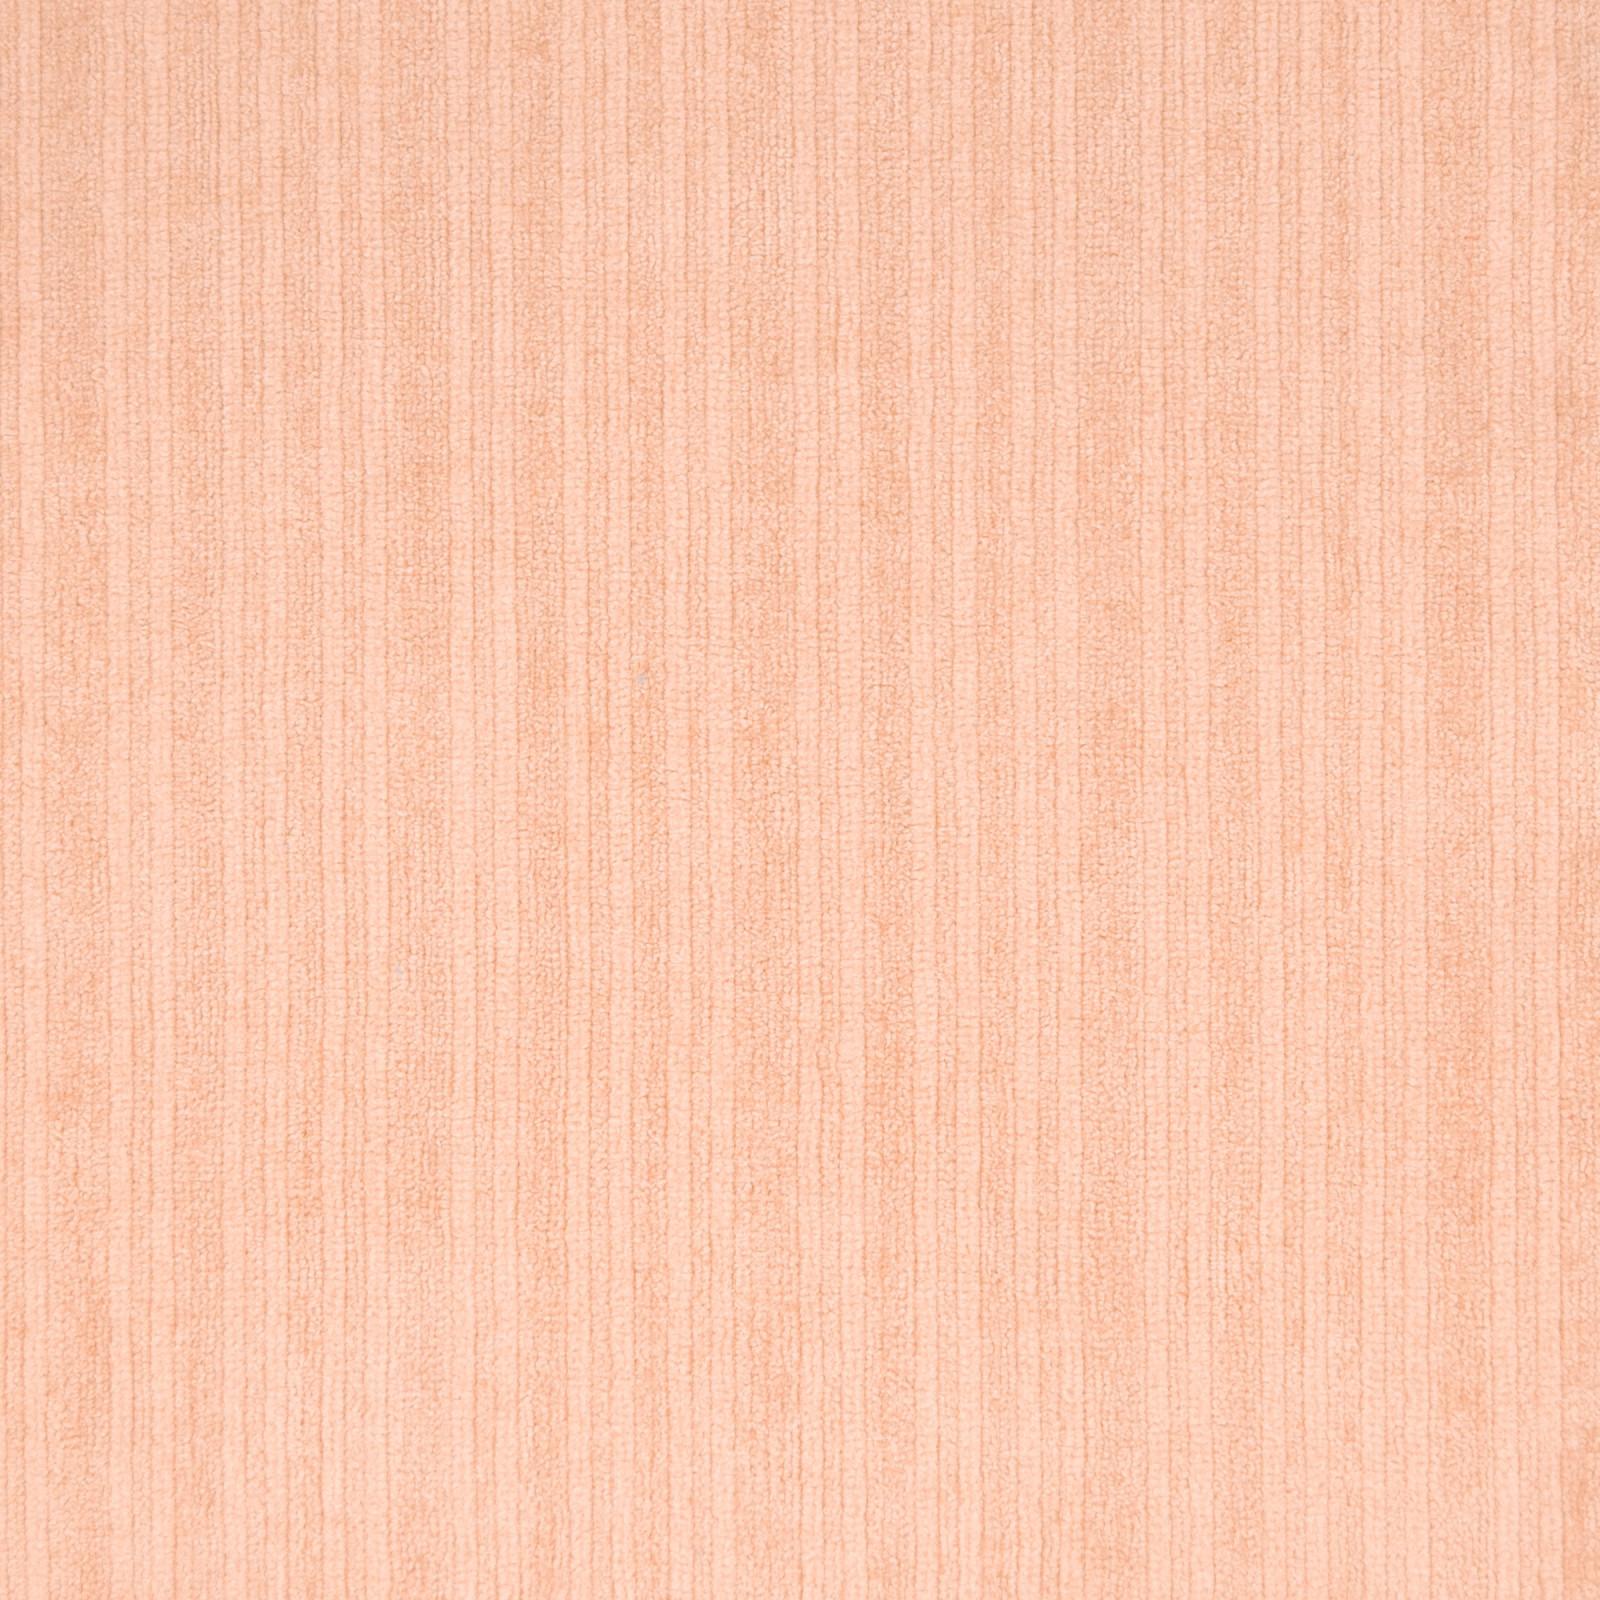 B6979 Peach Greenhouse Fabrics